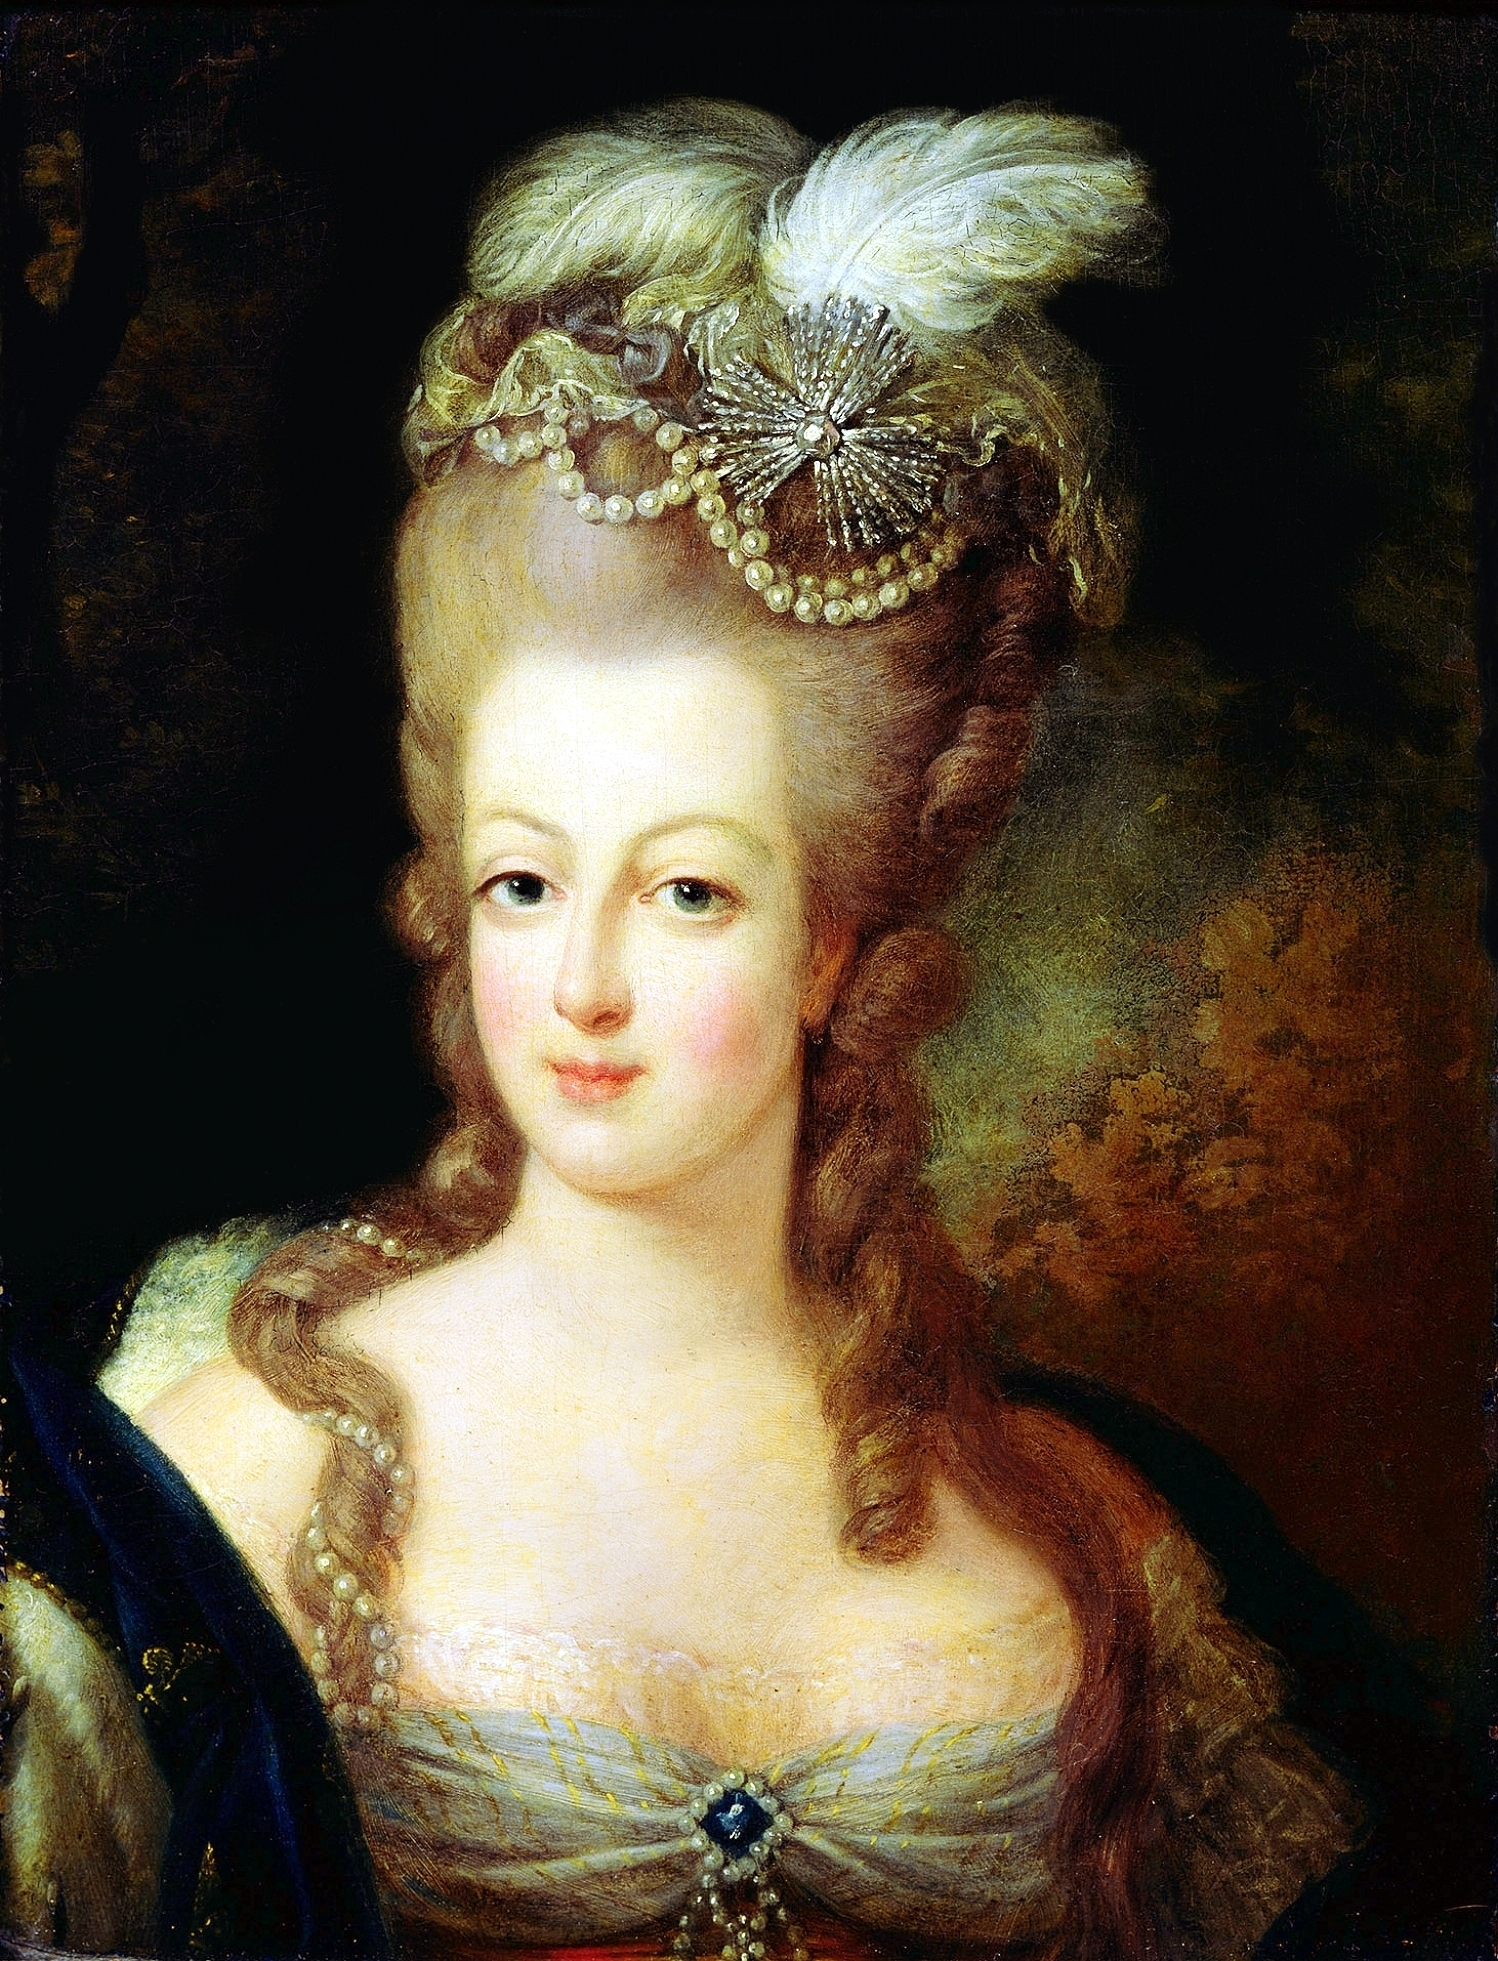 alexandra the great escort mistress mandy